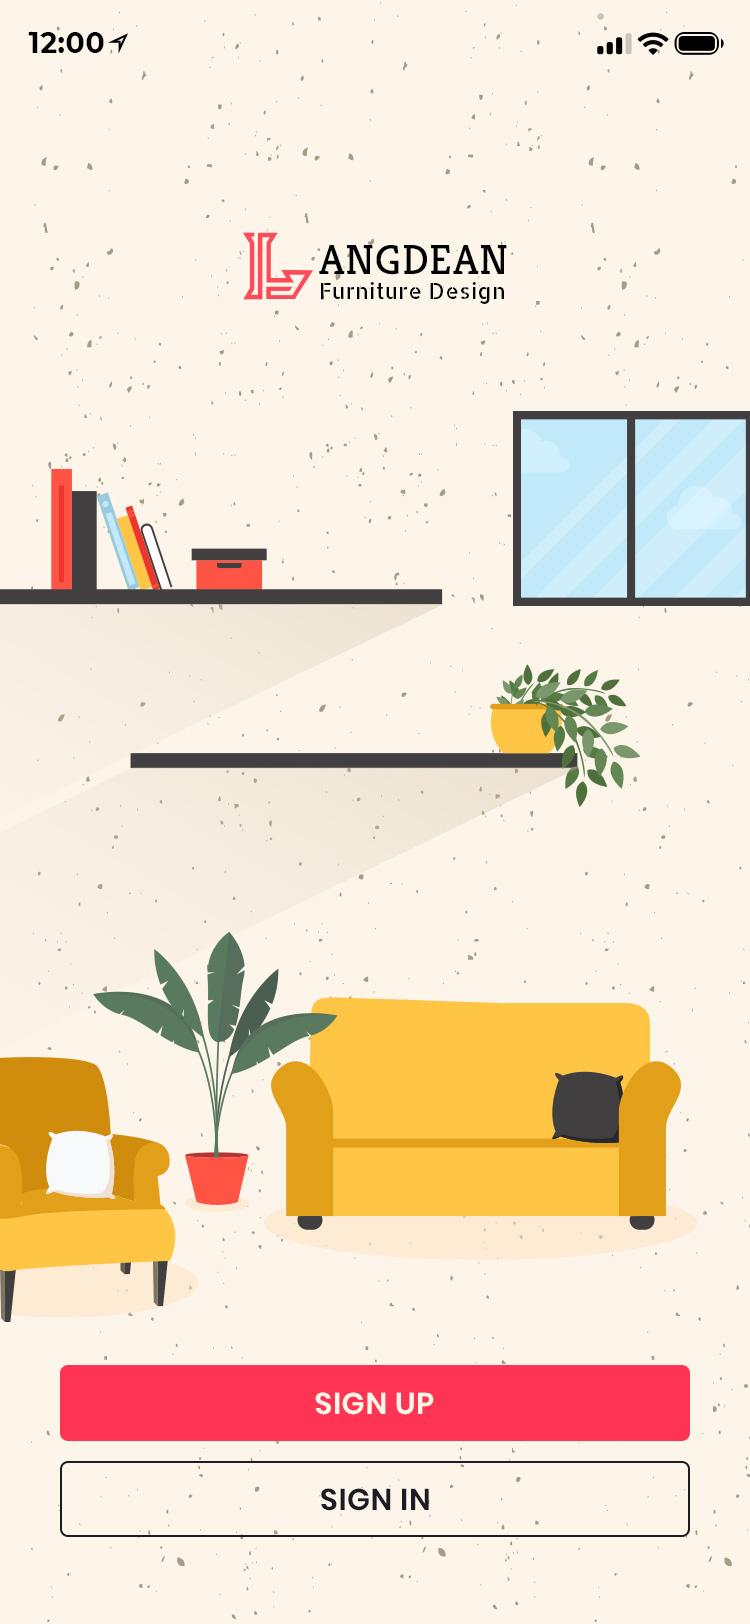 mobile-app-furniture-1